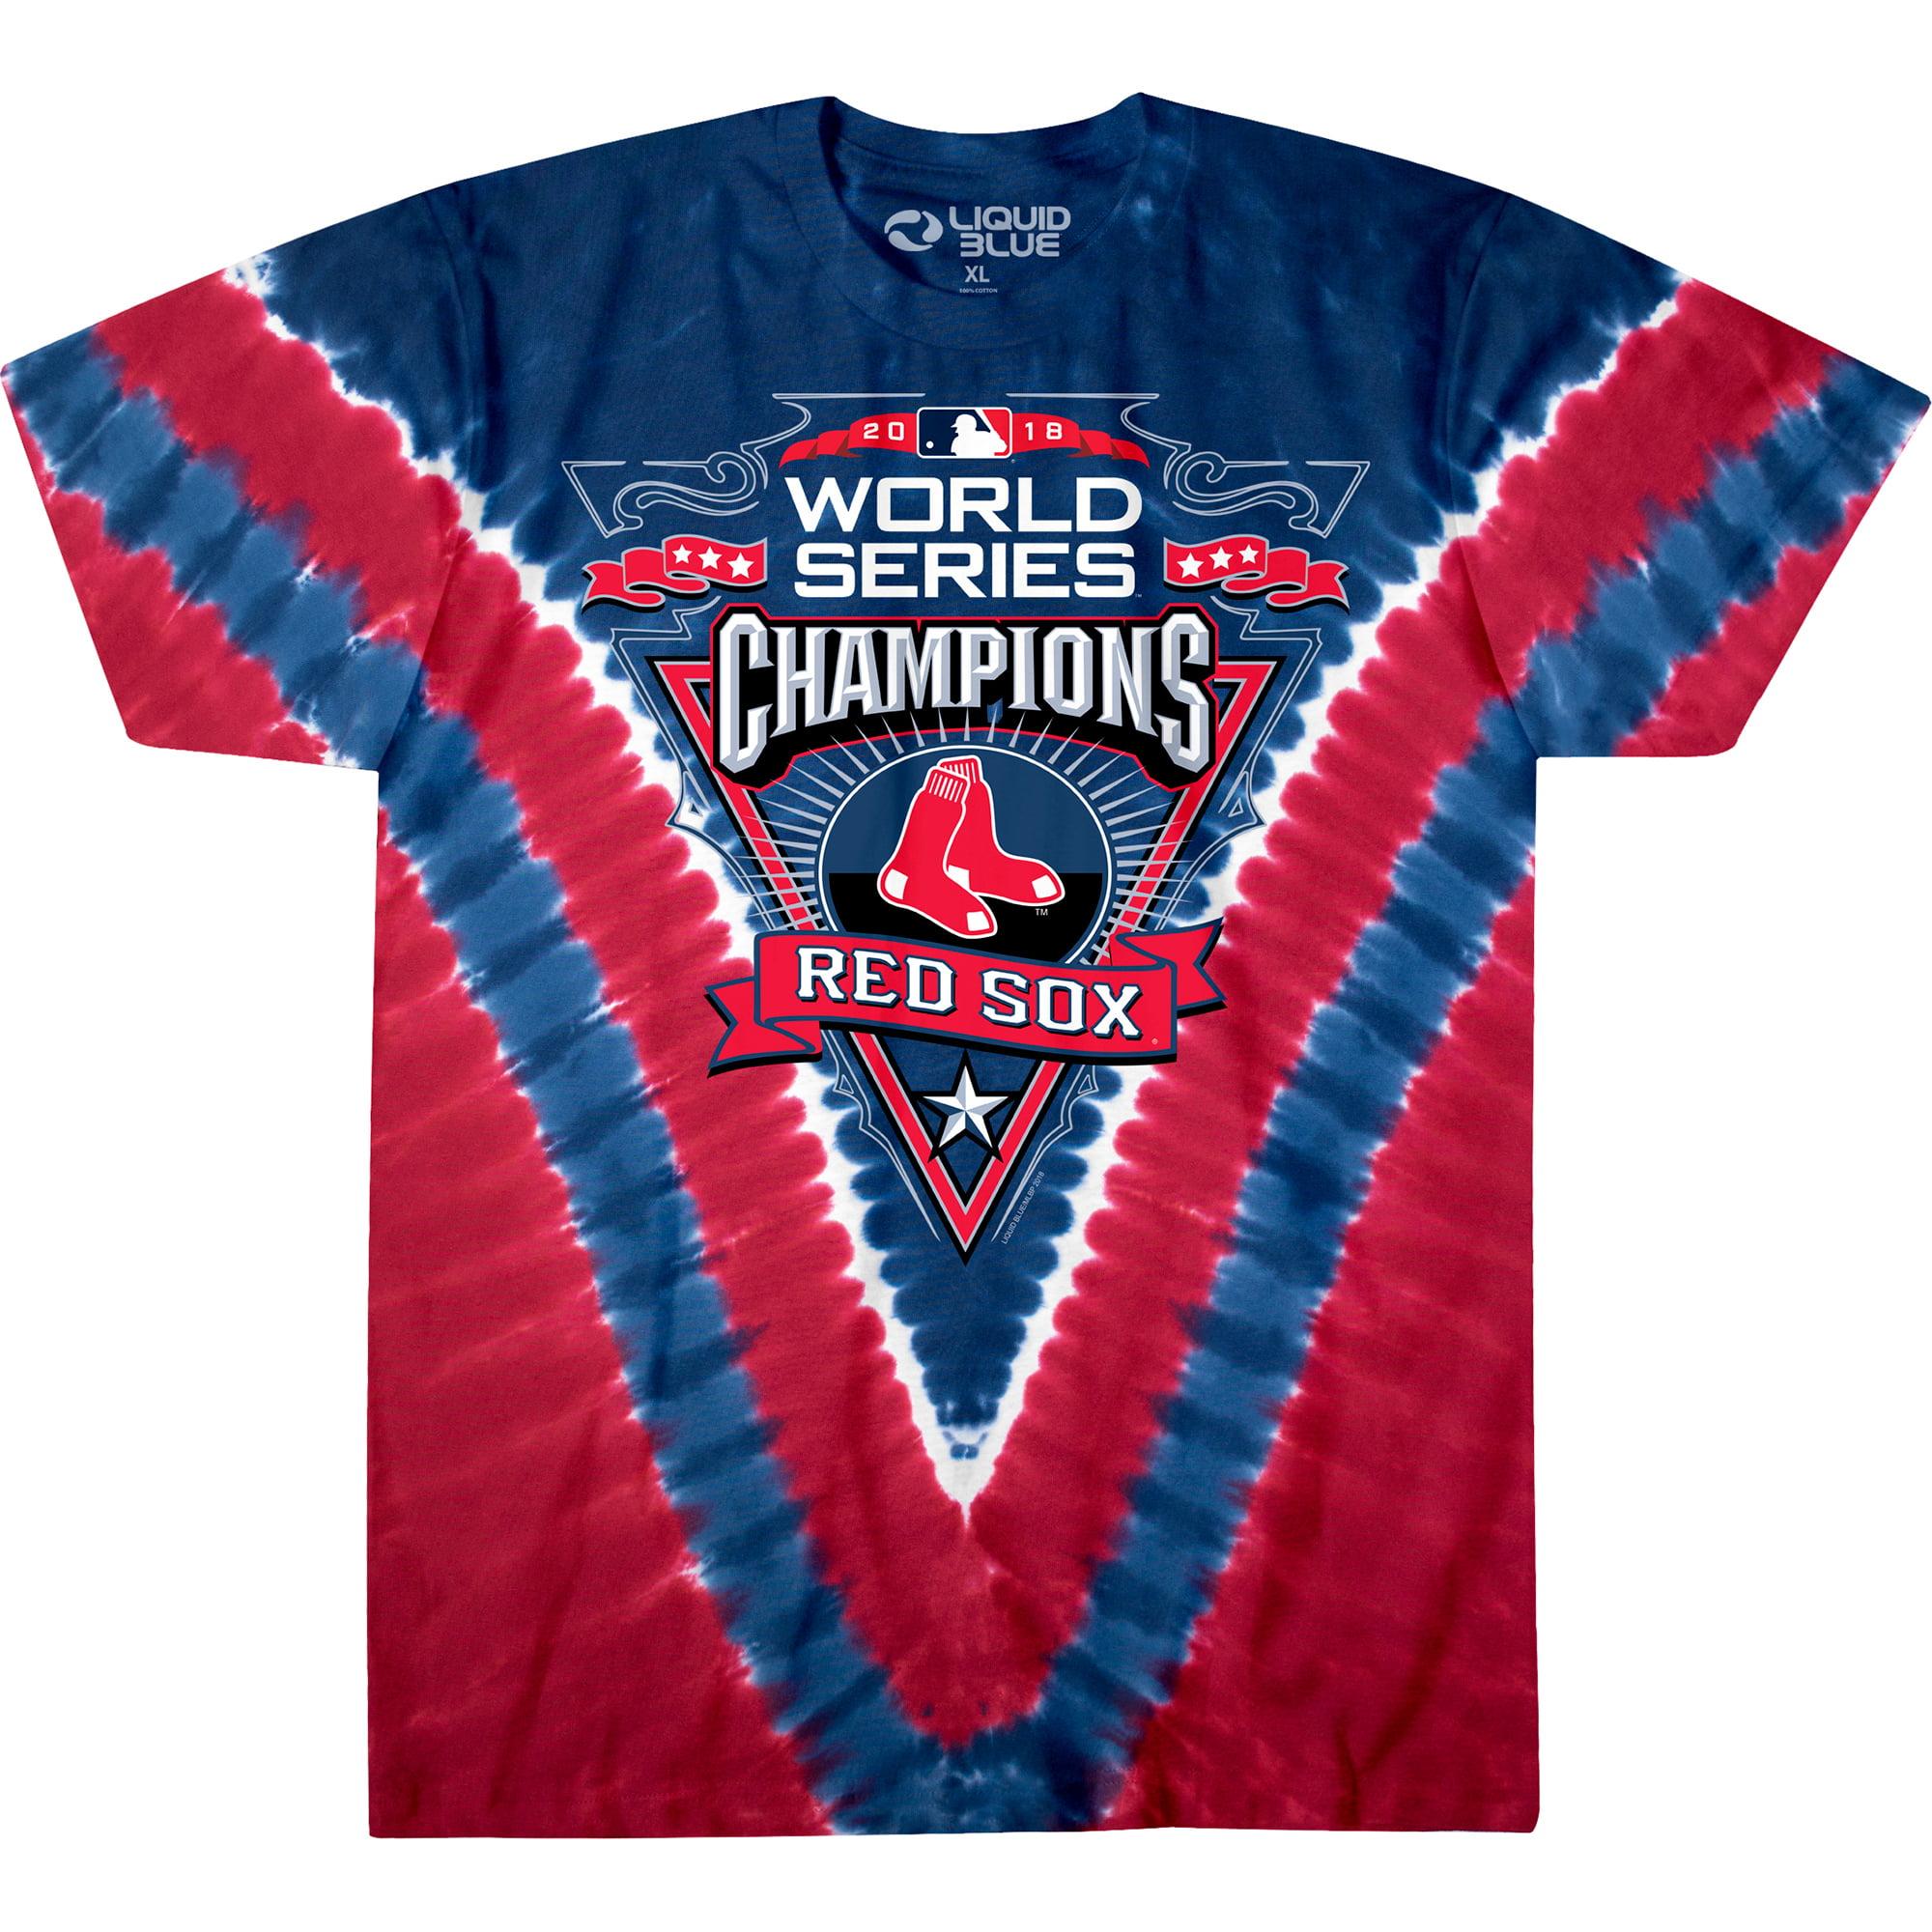 Boston Red Sox 2018 World Series Champions V-Dye T-Shirt - Red